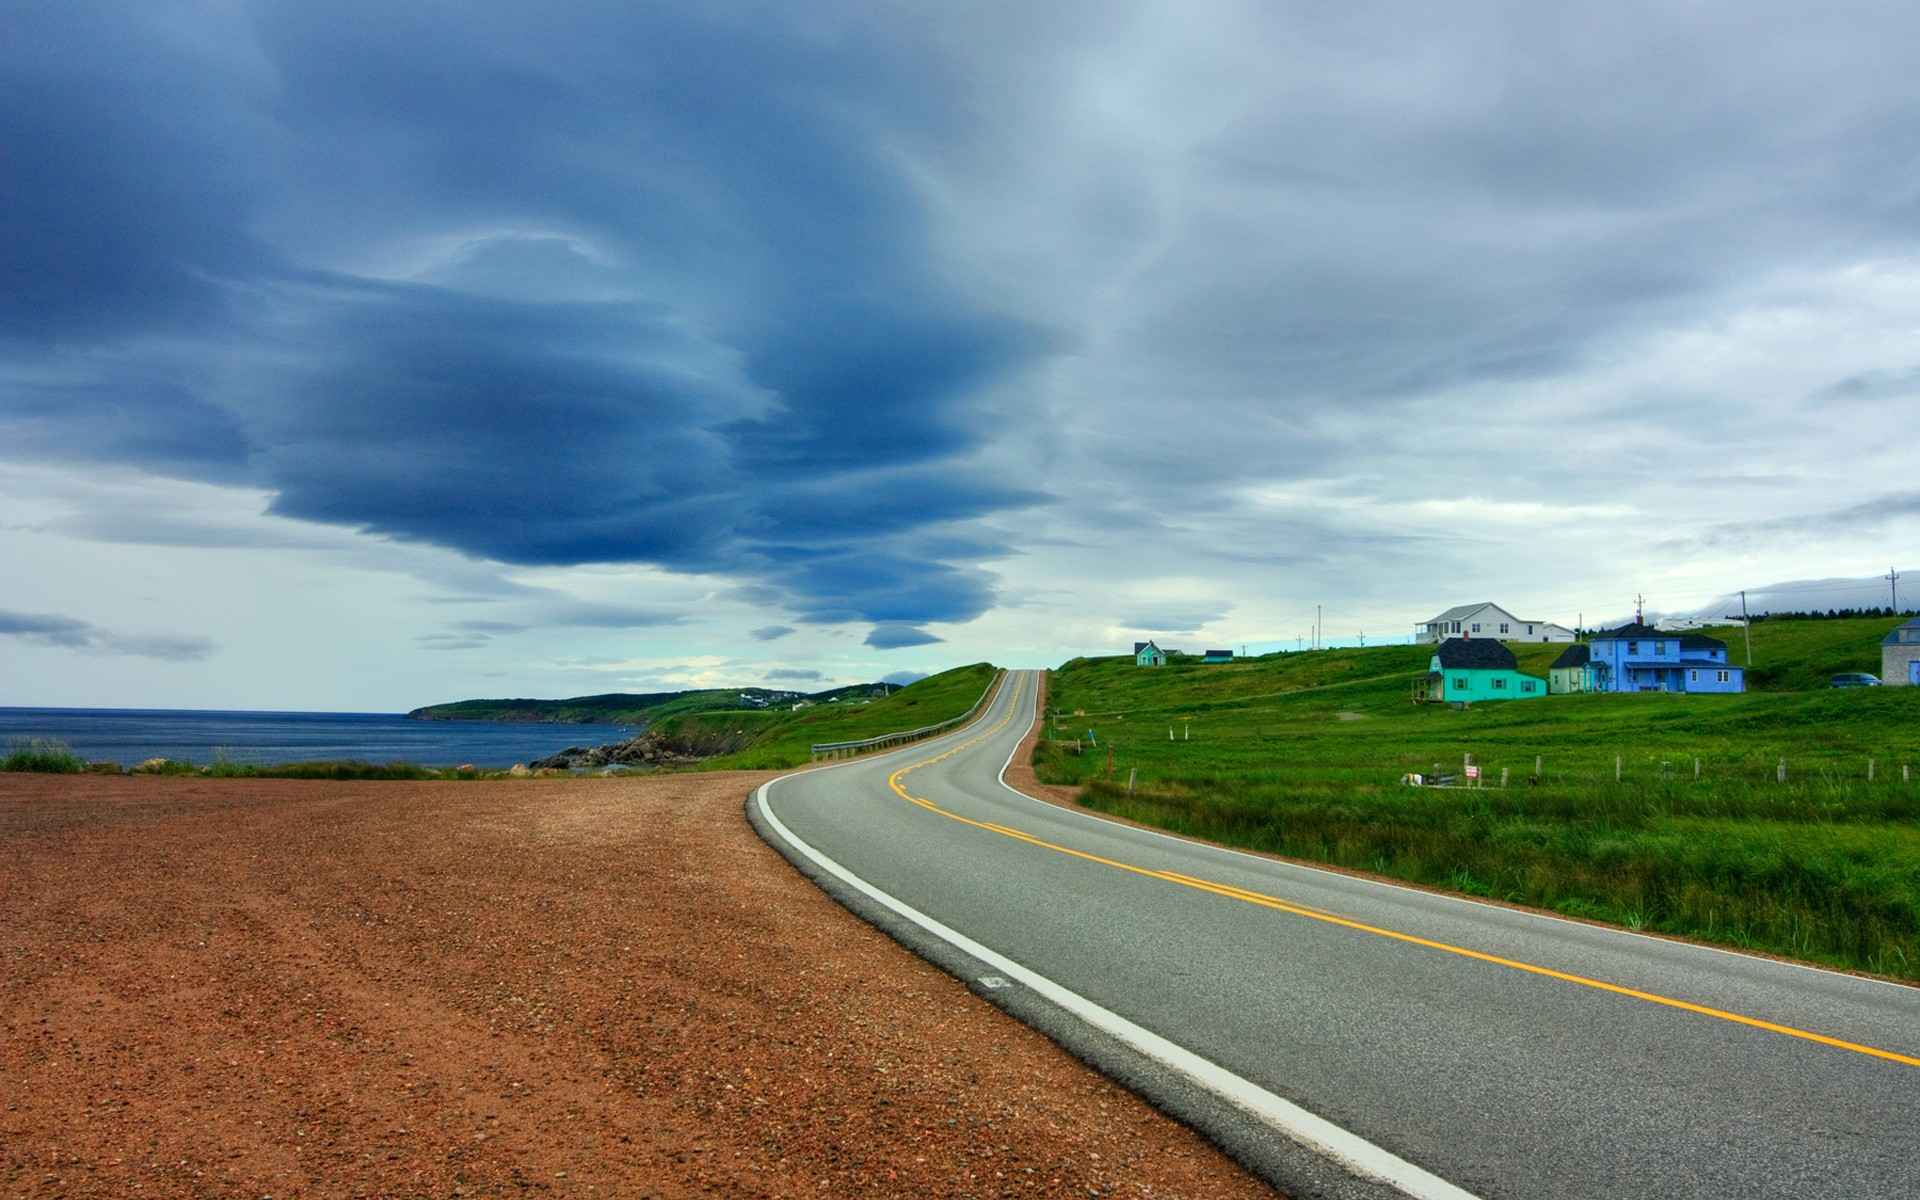 Una pista en paisaje - 1920x1200